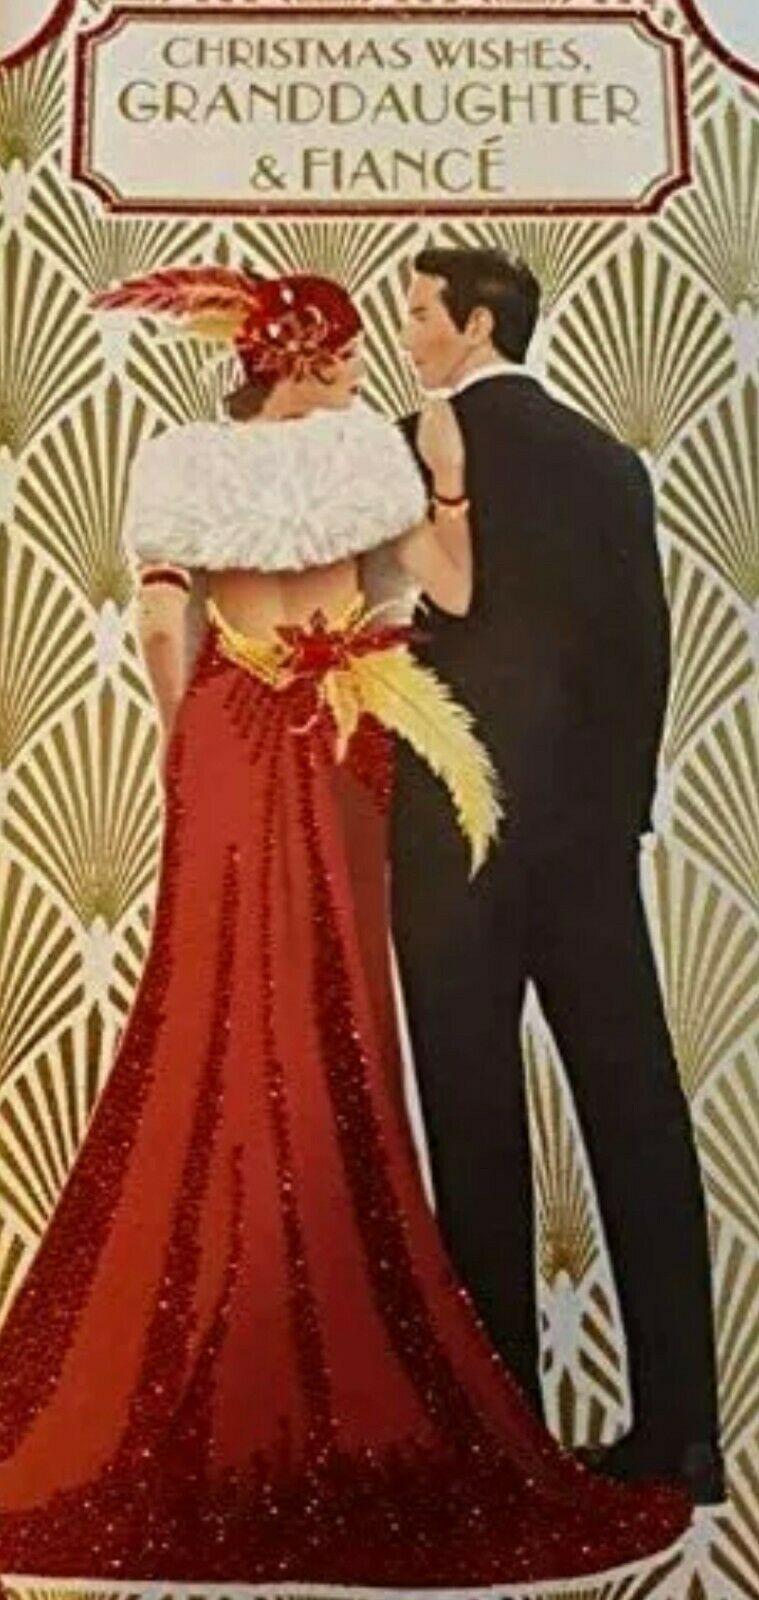 Art Deco Christmas Card - Christmas Wishes, Granddaughter & Fiancé